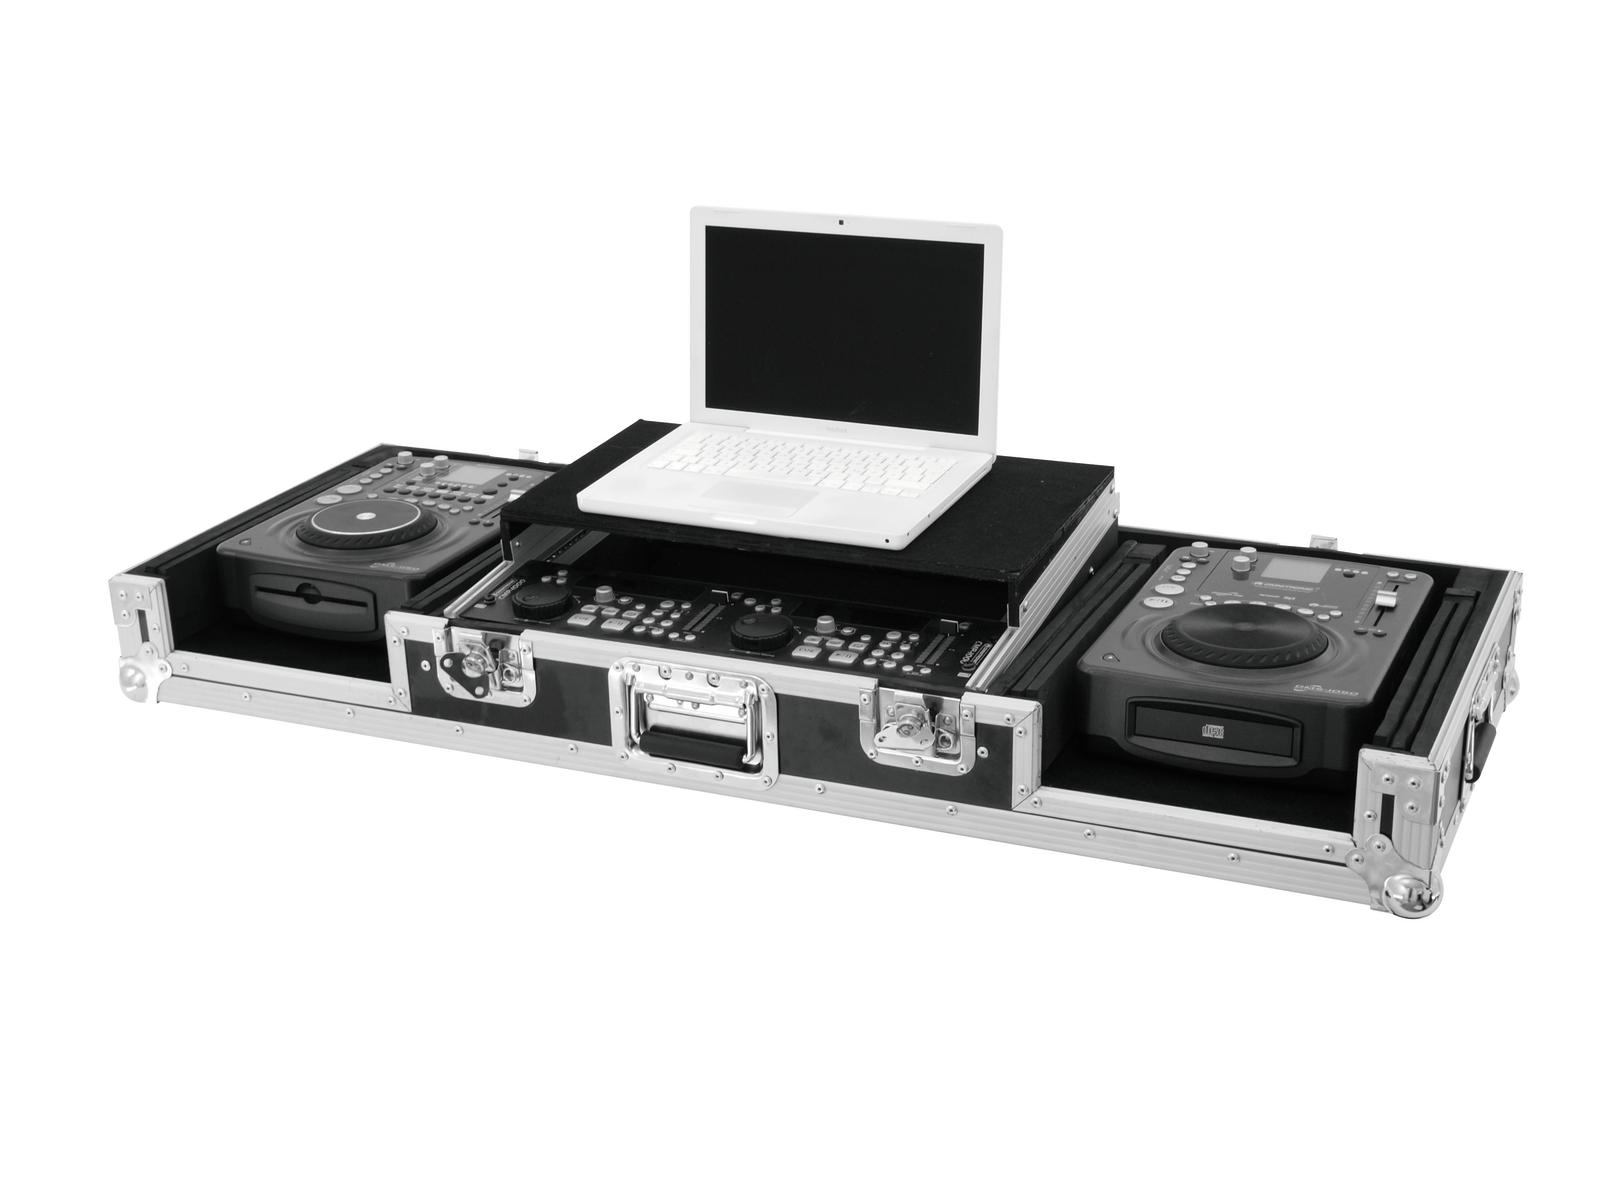 Flight Case Custodia Per Console Cdj Mixer Pc ROADINGER LS-1